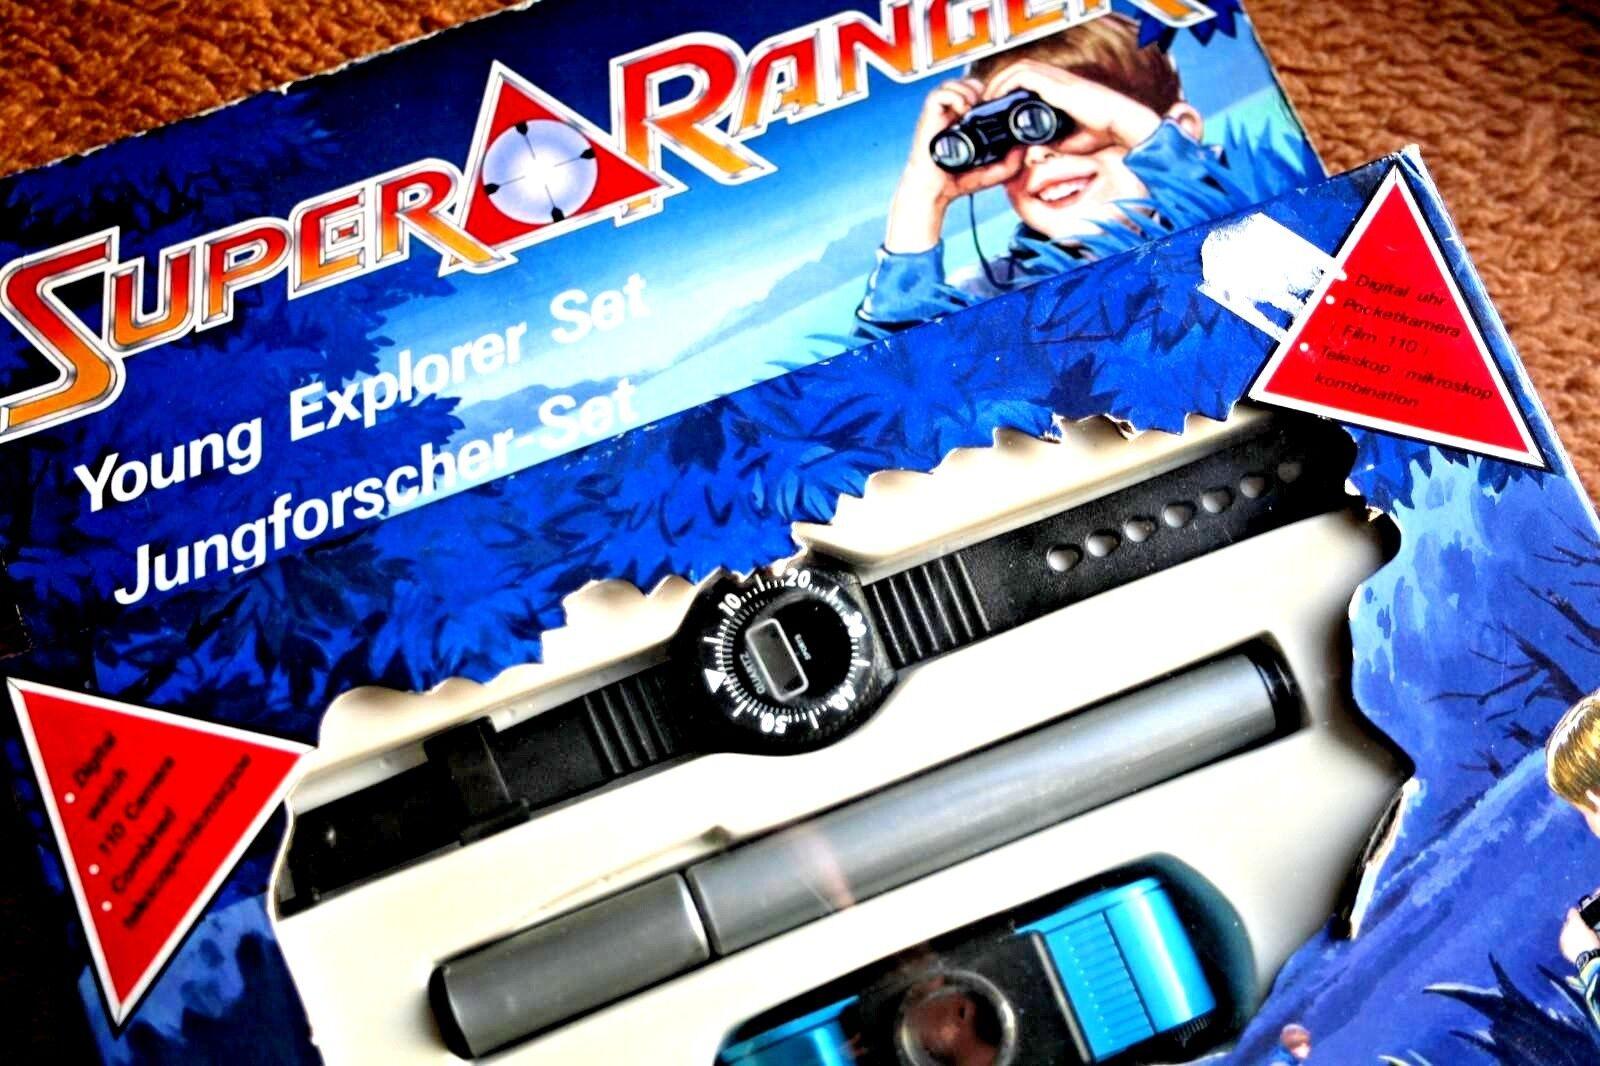 SUPER RANGER  YOUNG EXPLORER SET (BANDAI). WATCH, CAMERA, TELESCOPE  BRAND NEW